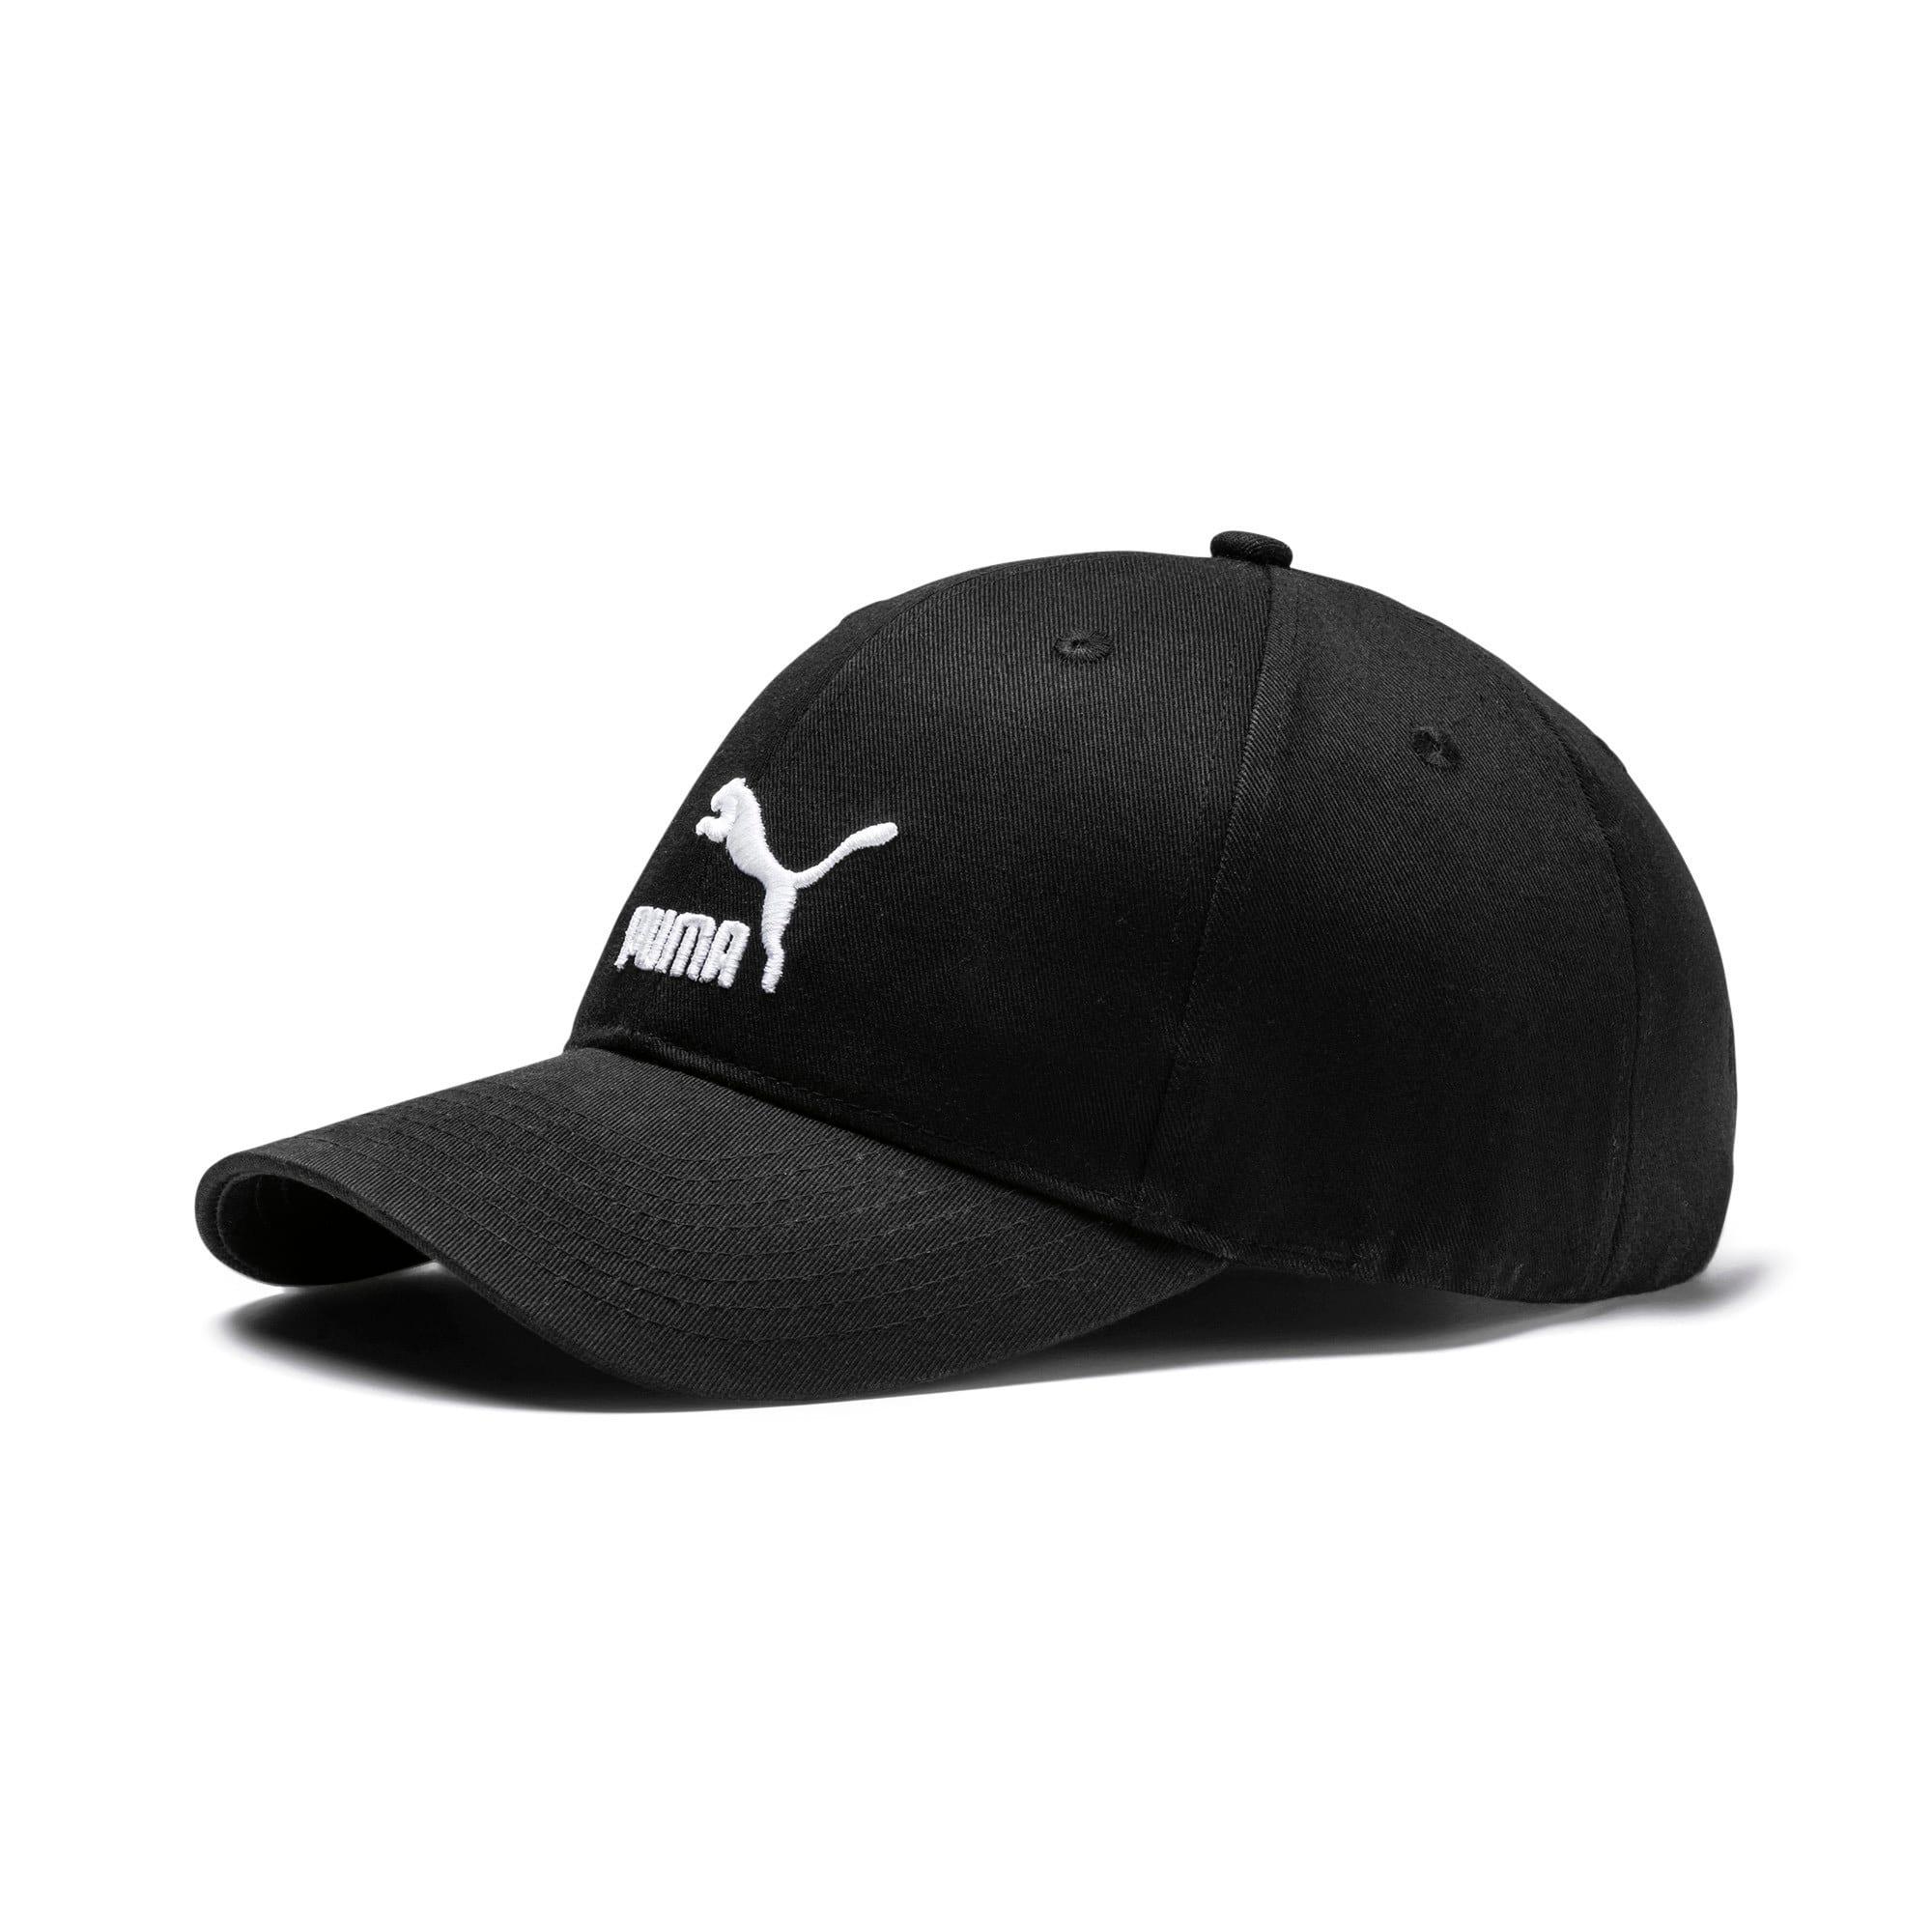 Thumbnail 1 of Archive Logo Baseball Cap, Puma Black, medium